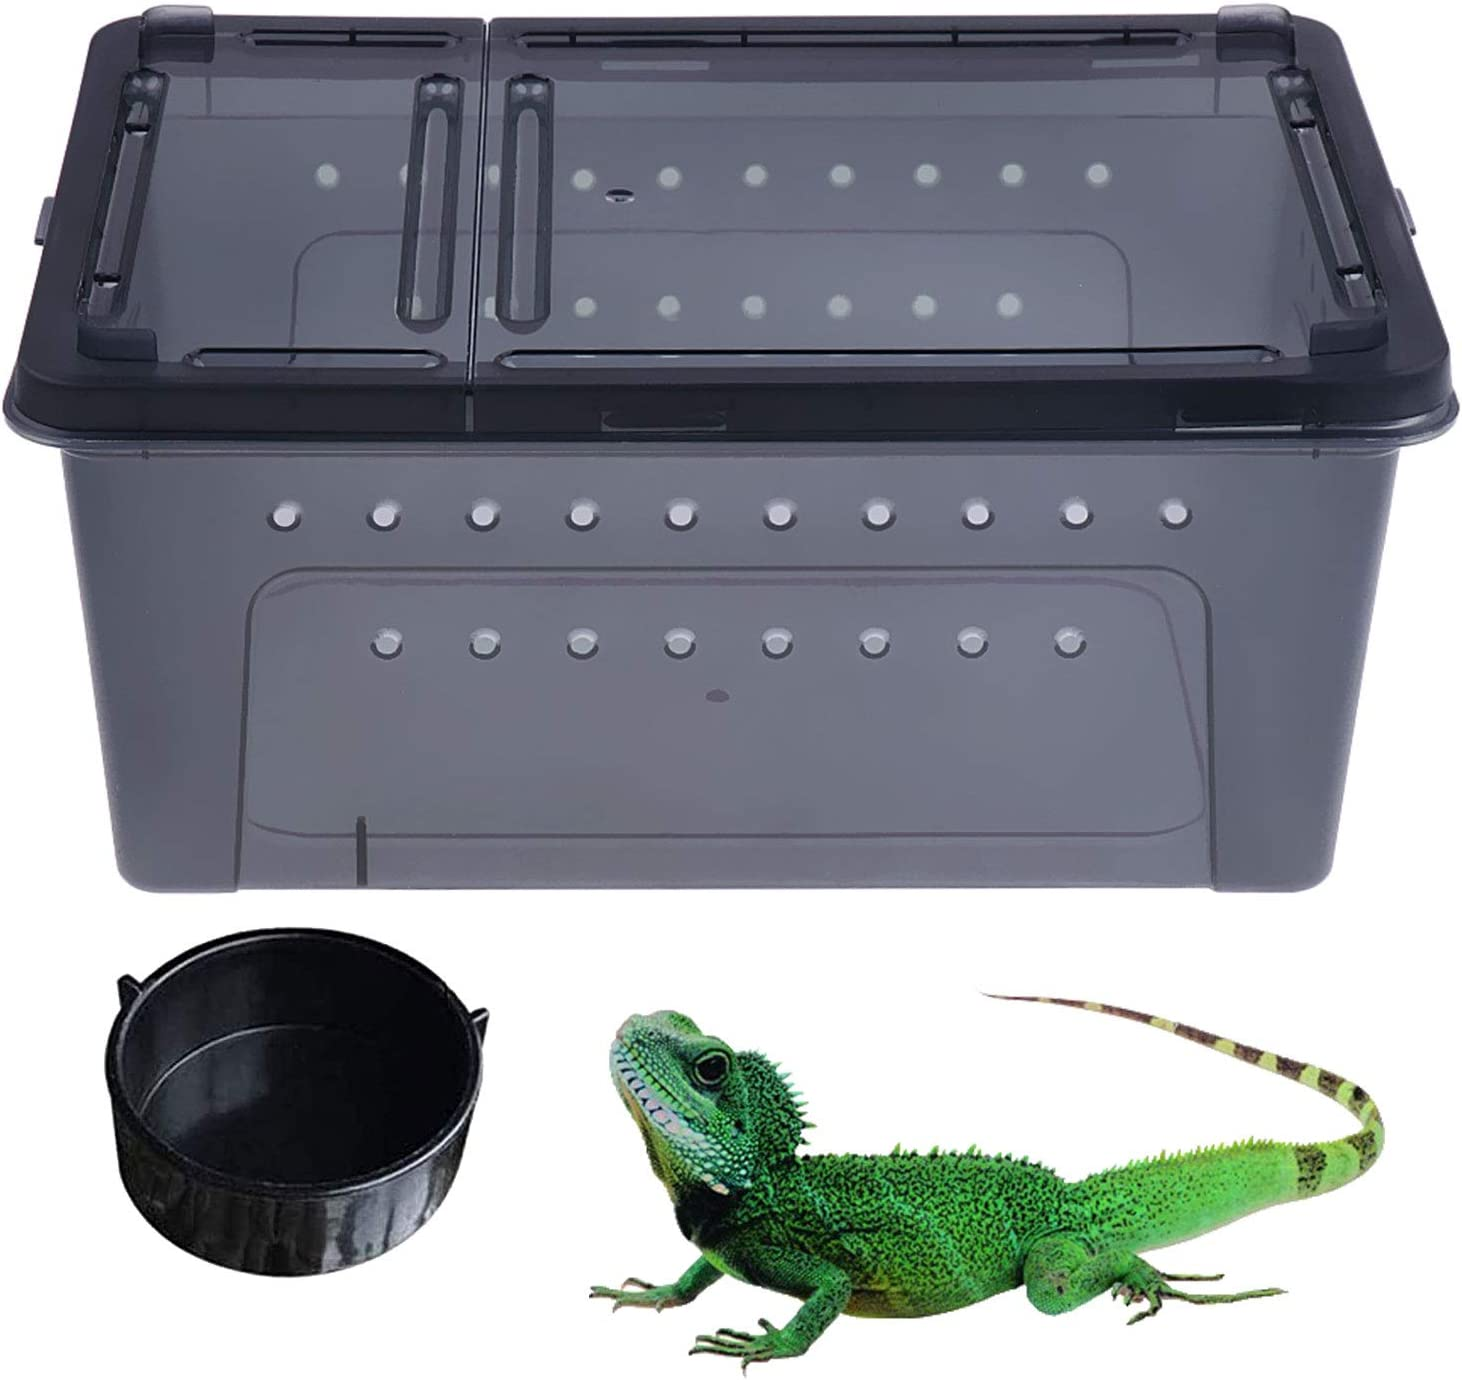 kathson Reptile Snake Feeding Box Breeding Hatching Container Lizard Tarantula Habitat Portable Transparent Plastic Mini Pet Houses for Spider Scorpion Gecko